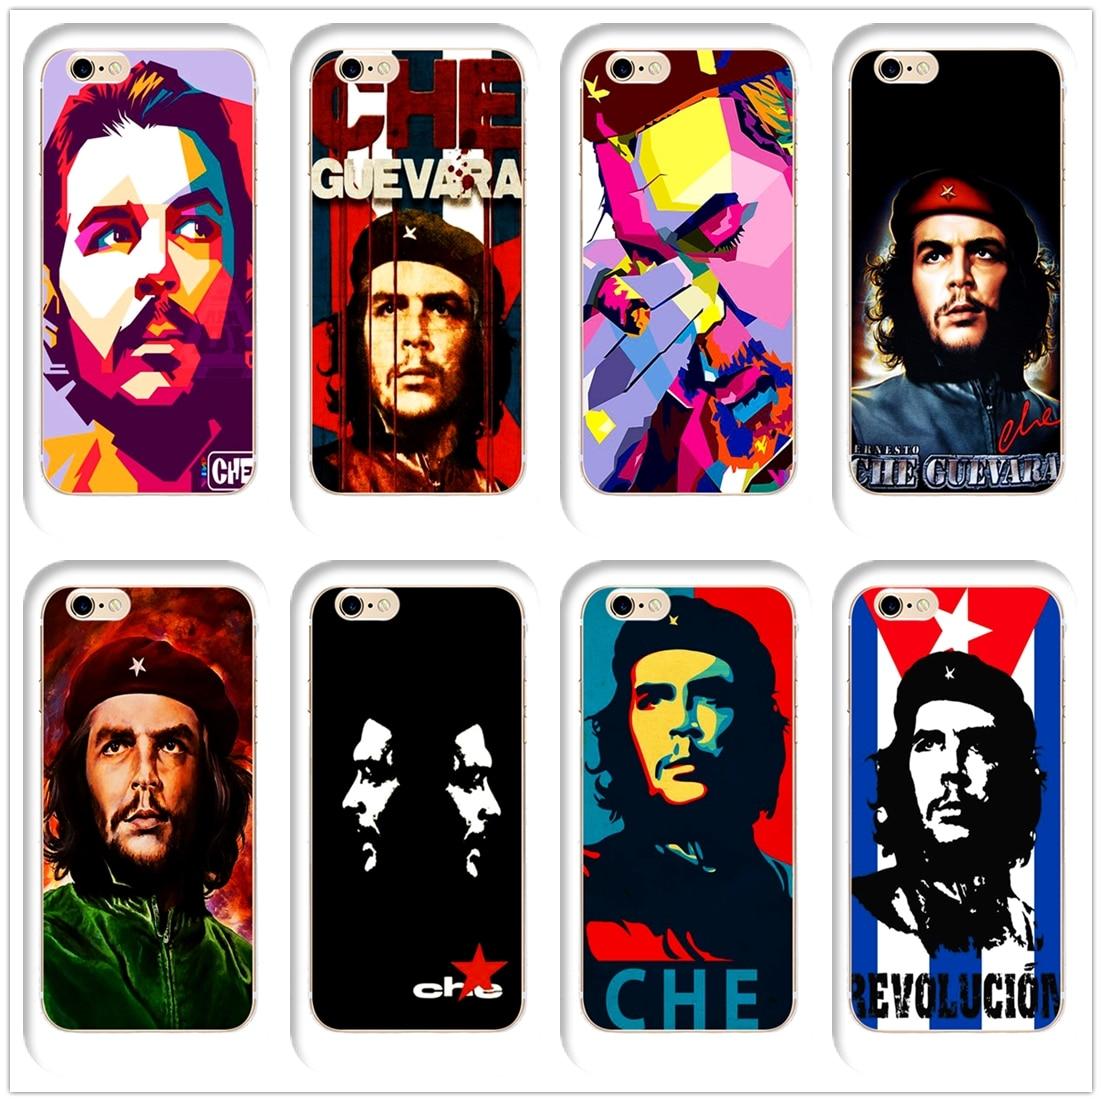 DK Ernesto CHE Guevara Cuban hero fashion phone Case Cover for Hard Transparen for iPhone 6 6s 7 8plus 5s 5c 4s X XS XR XSMAX